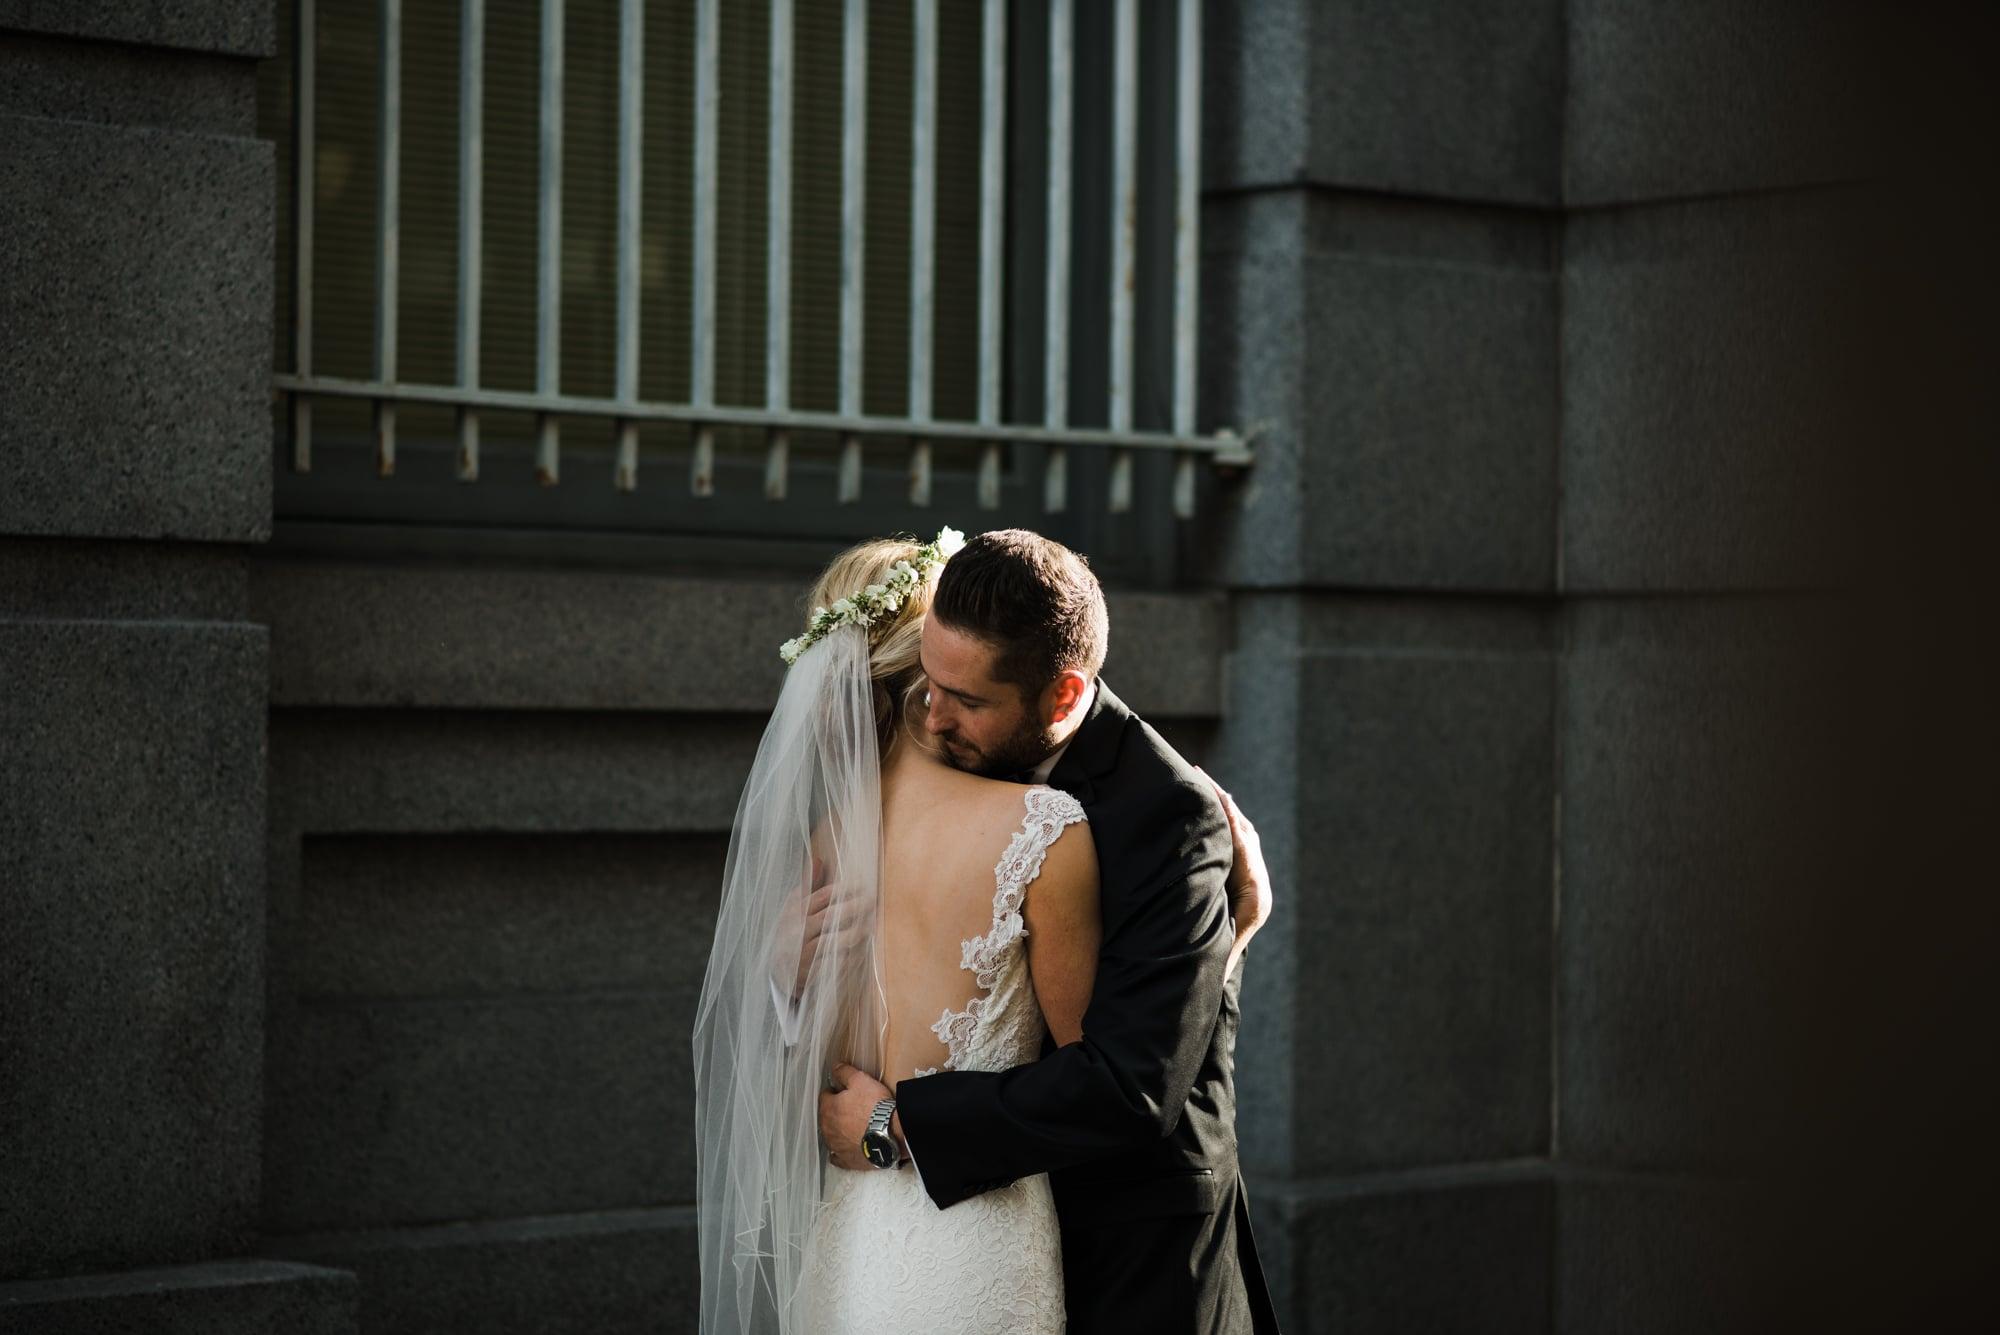 ©Isaiah & Taylor Photography - The Elms Mansion Wedding - New Orleans, Louisiana-22.jpg